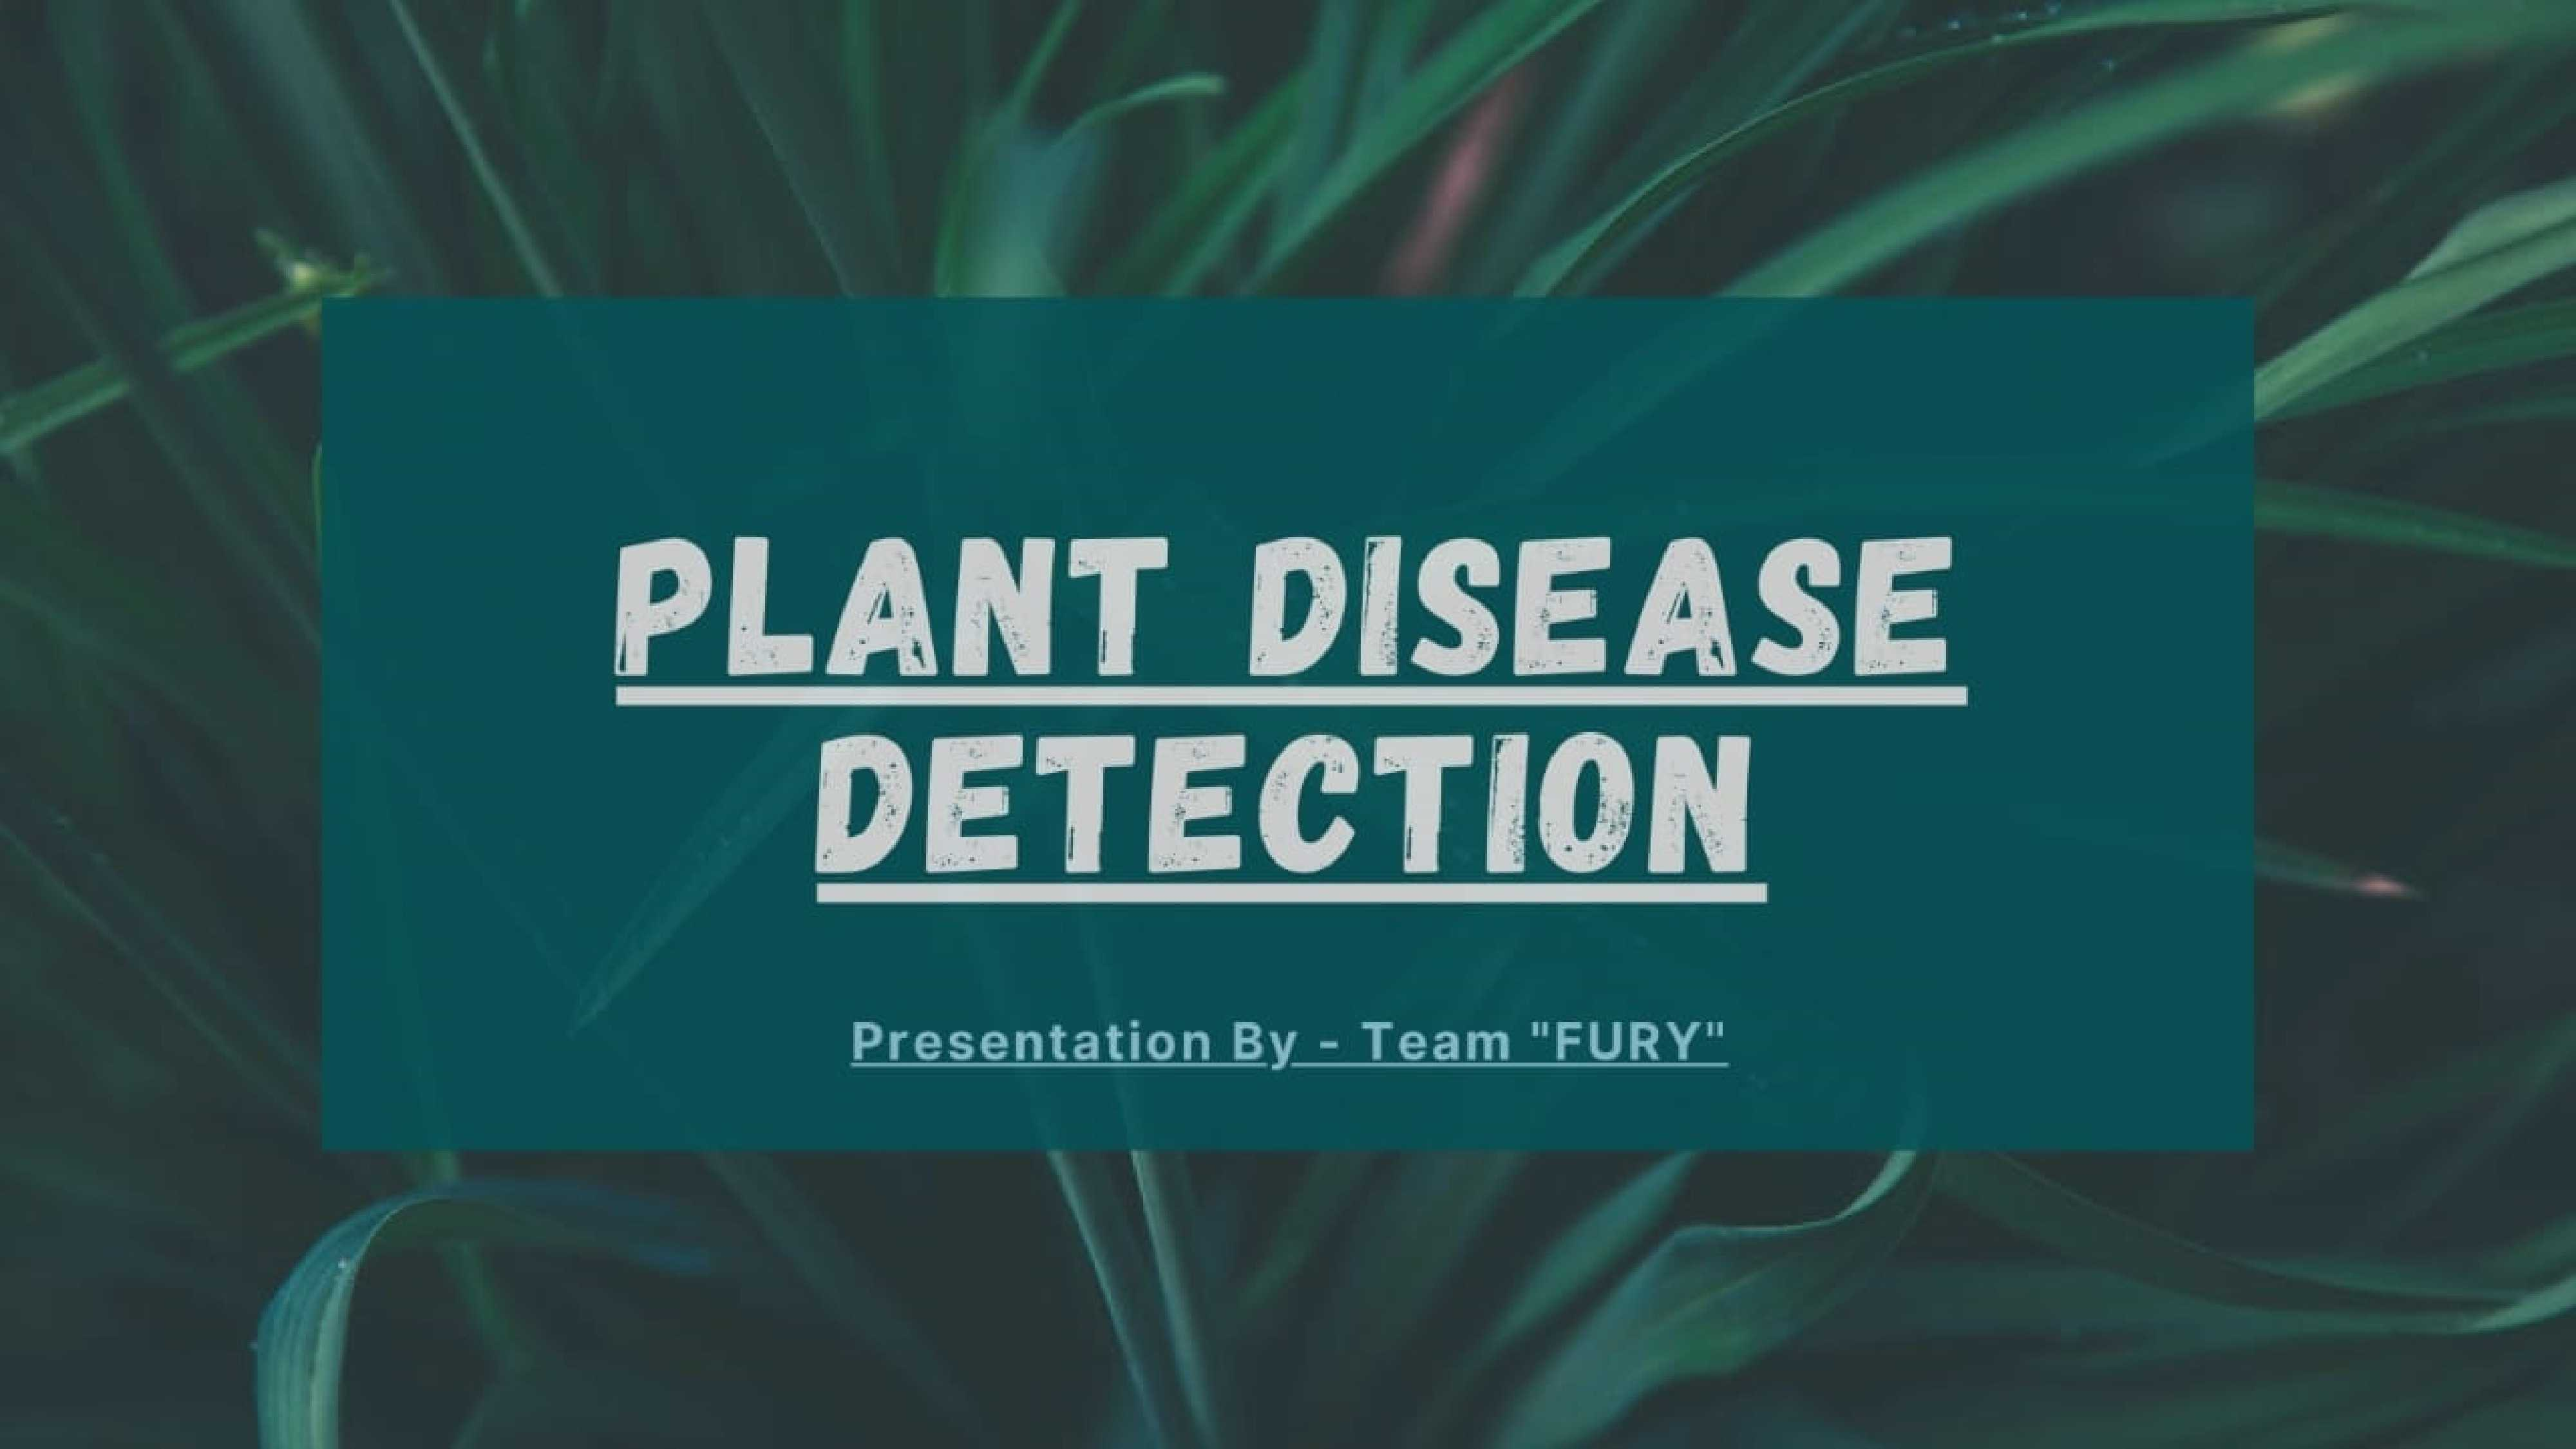 https://cloud-bm46jr1qd-hack-club-bot.vercel.app/0plant_disease_detection-0.jpg